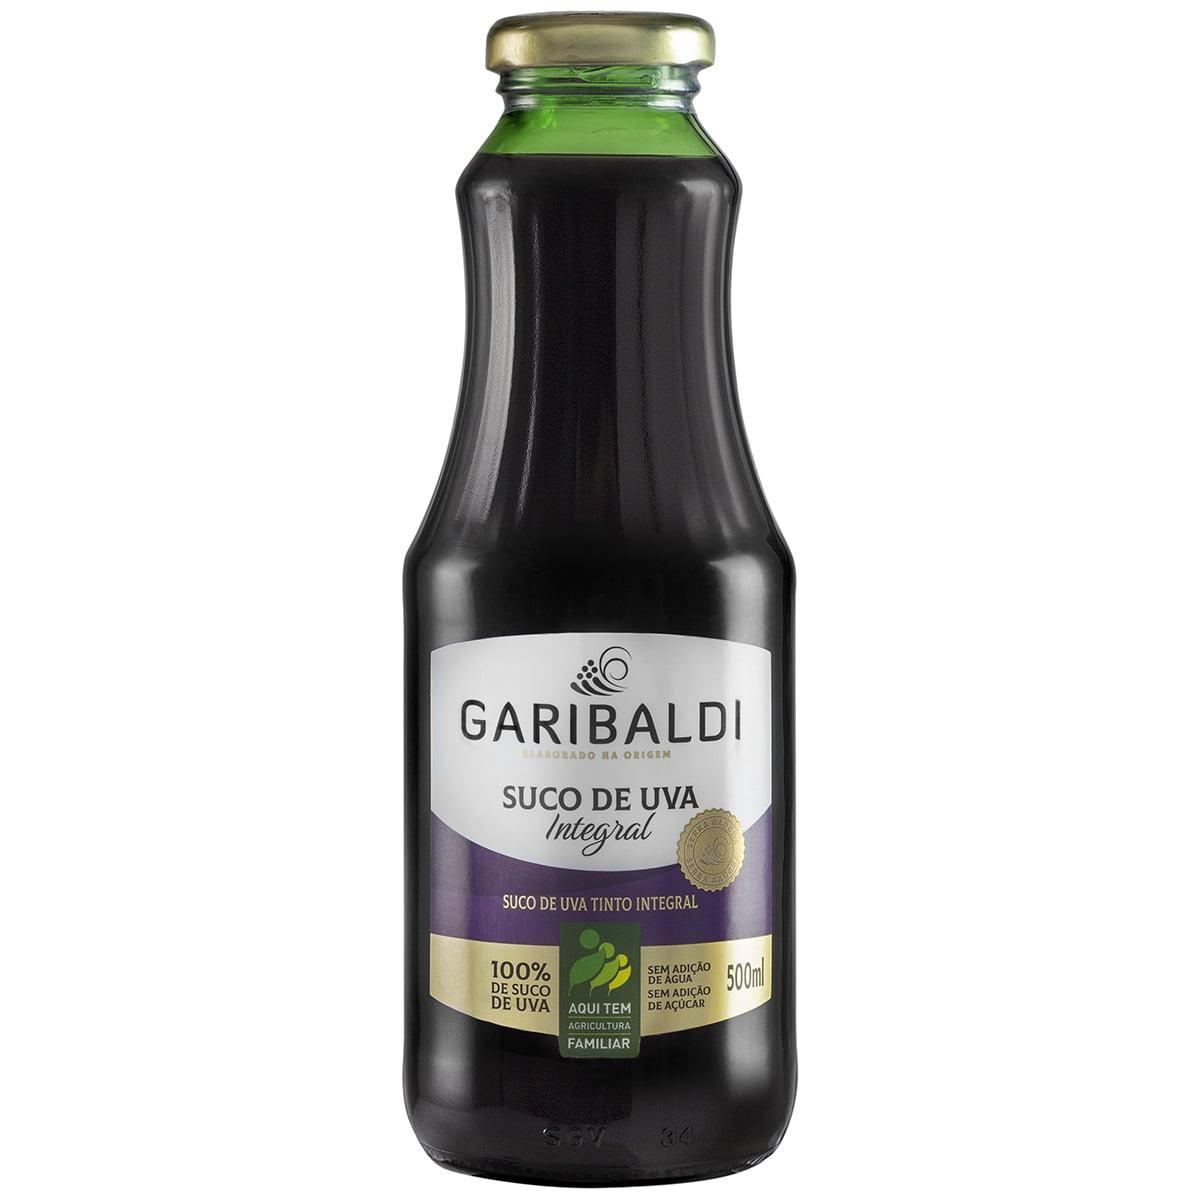 Suco de Uva Garibaldi Tinto Integral 500ml